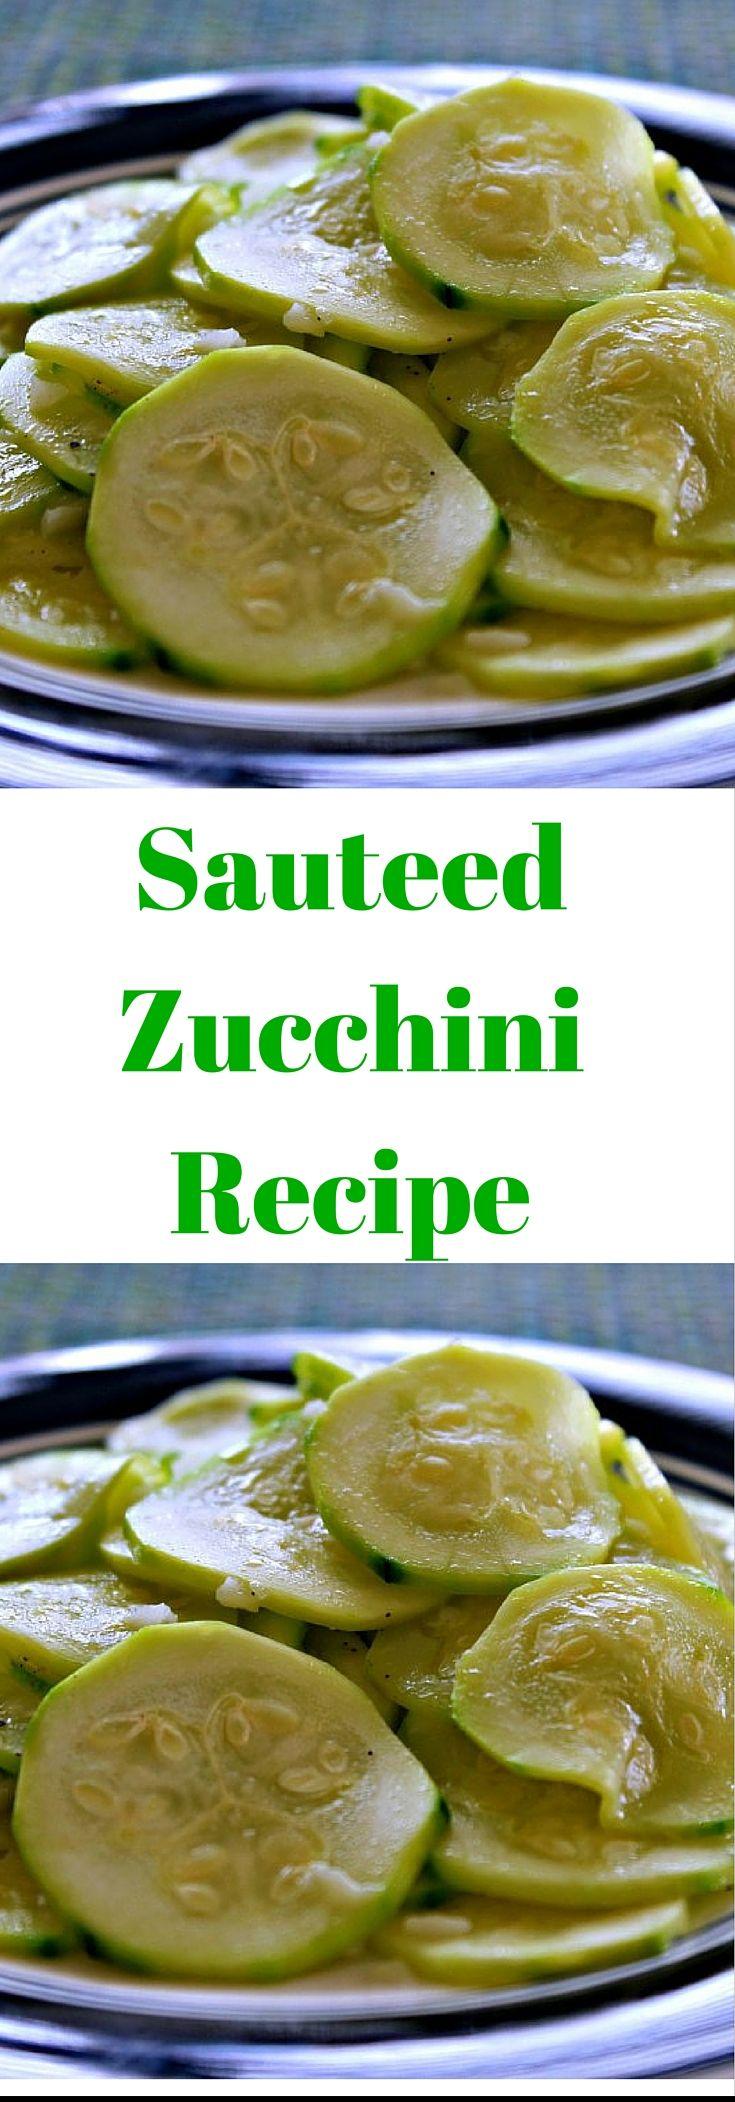 100+ Sauteed zucchini recipes on Pinterest | Sauteed ...